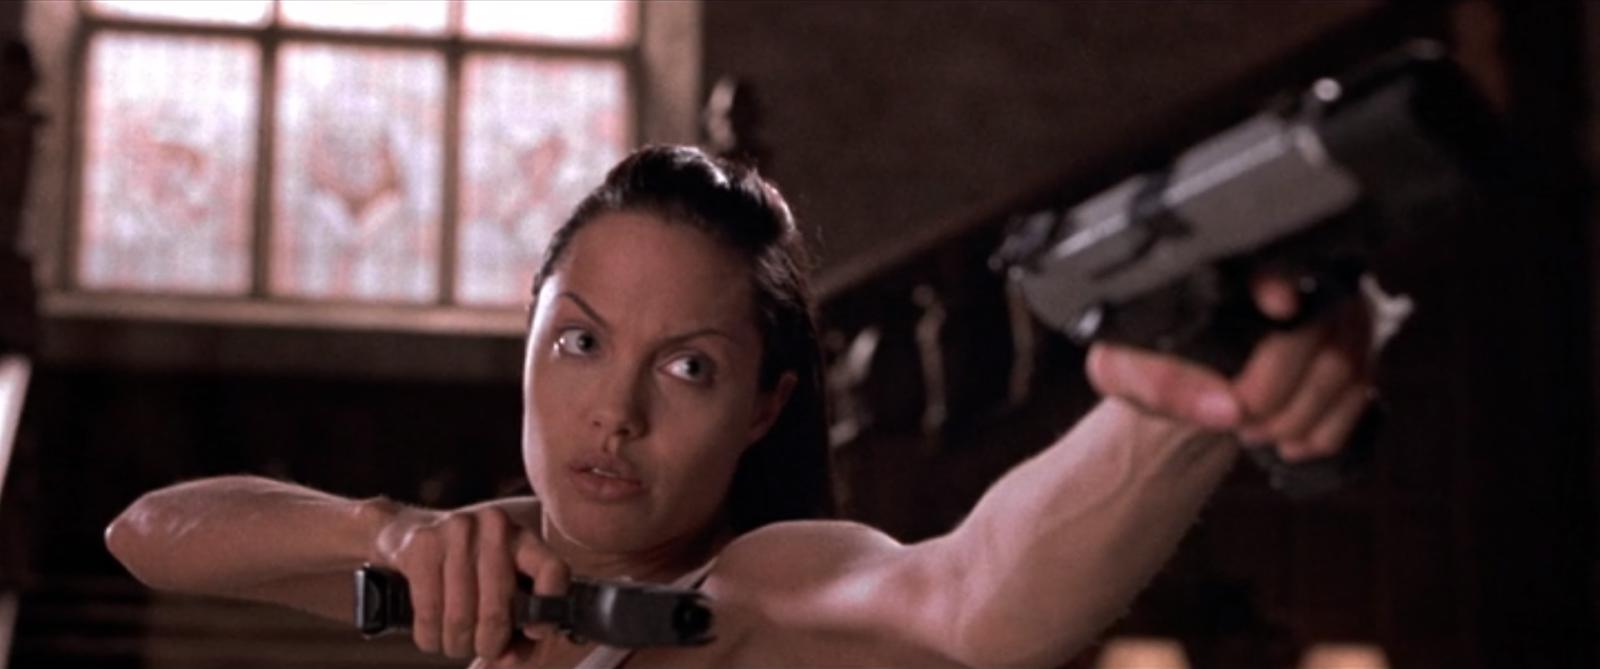 Лара Крофт: Расхитительница гробниц (Lara Croft: Tomb Raider)2001